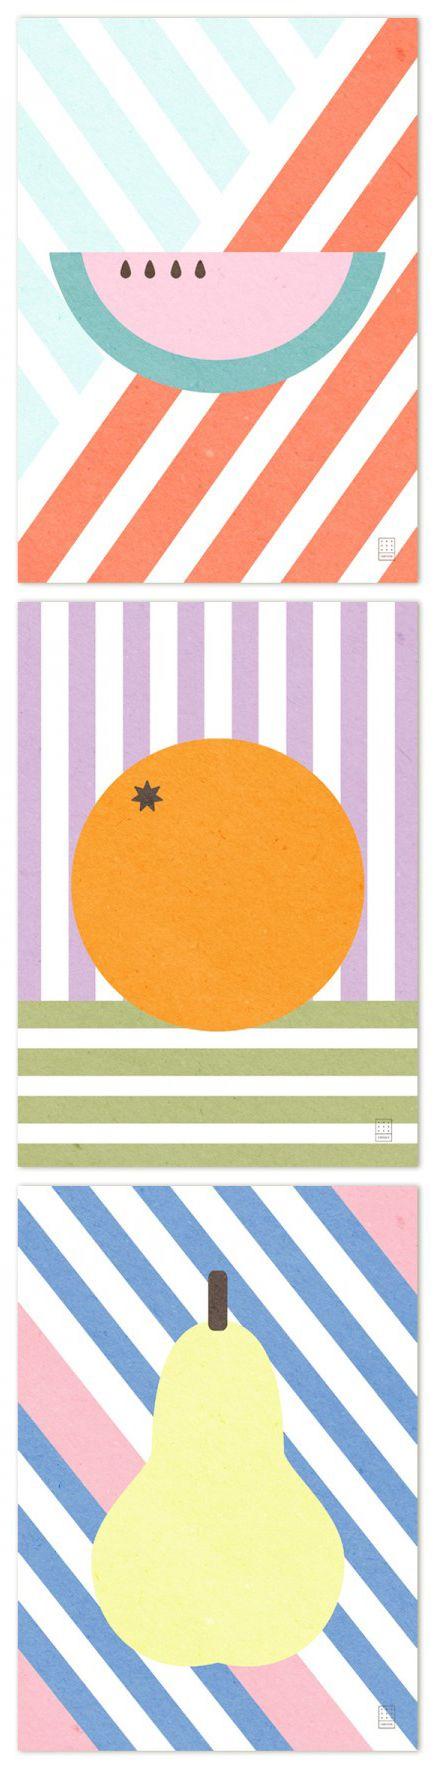 LUKAS Giclée Prints by Swiden Design FFAF Inspiration